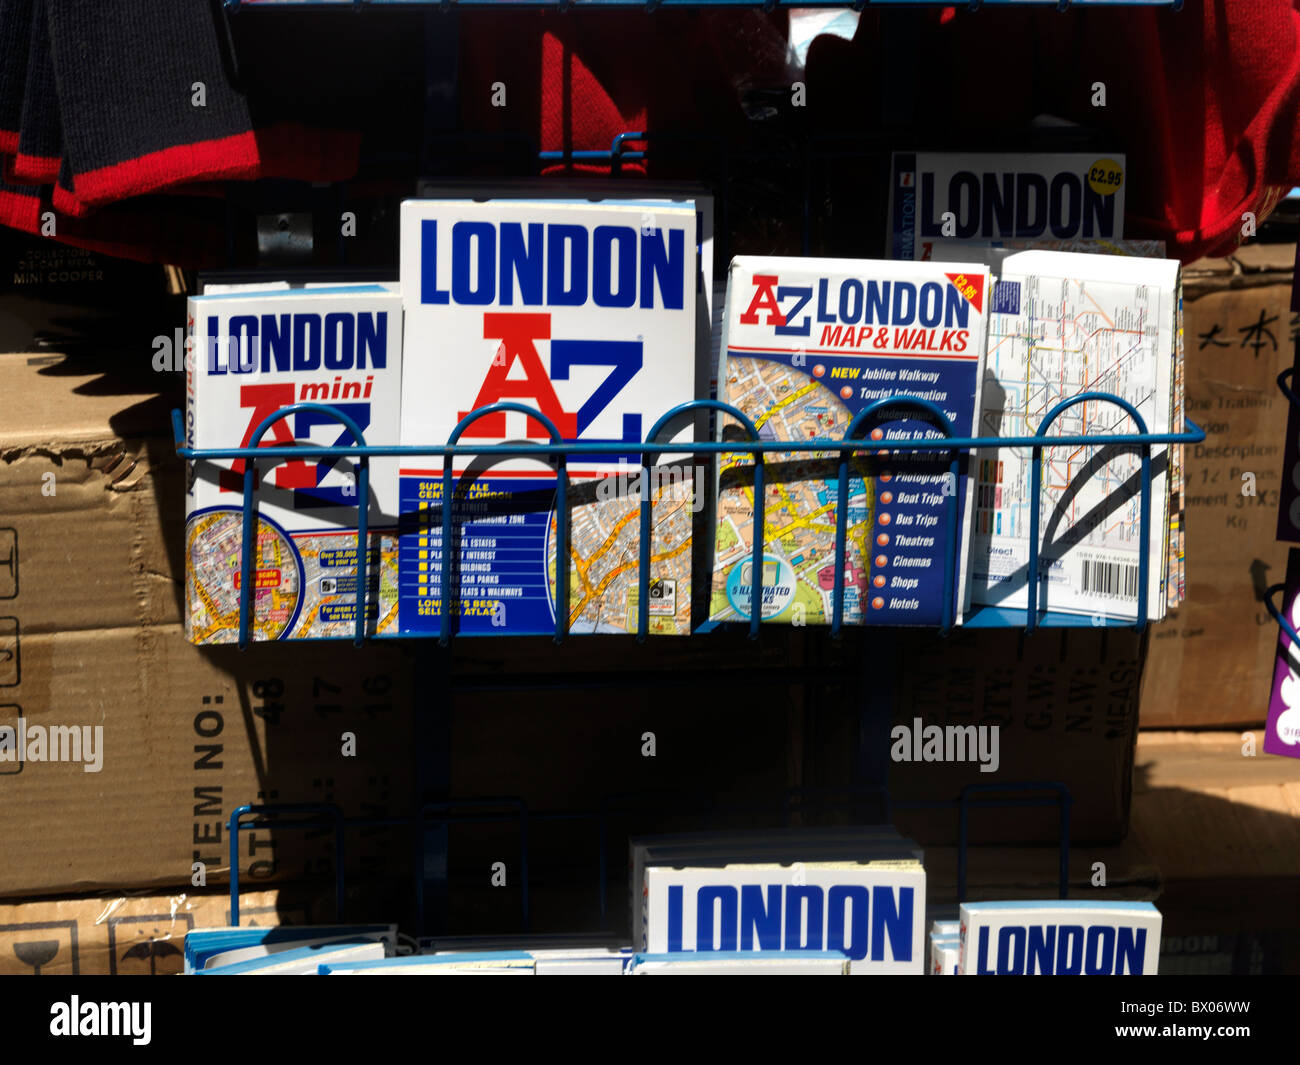 A Z Map Of England.London A Z Map Stock Photos London A Z Map Stock Images Alamy